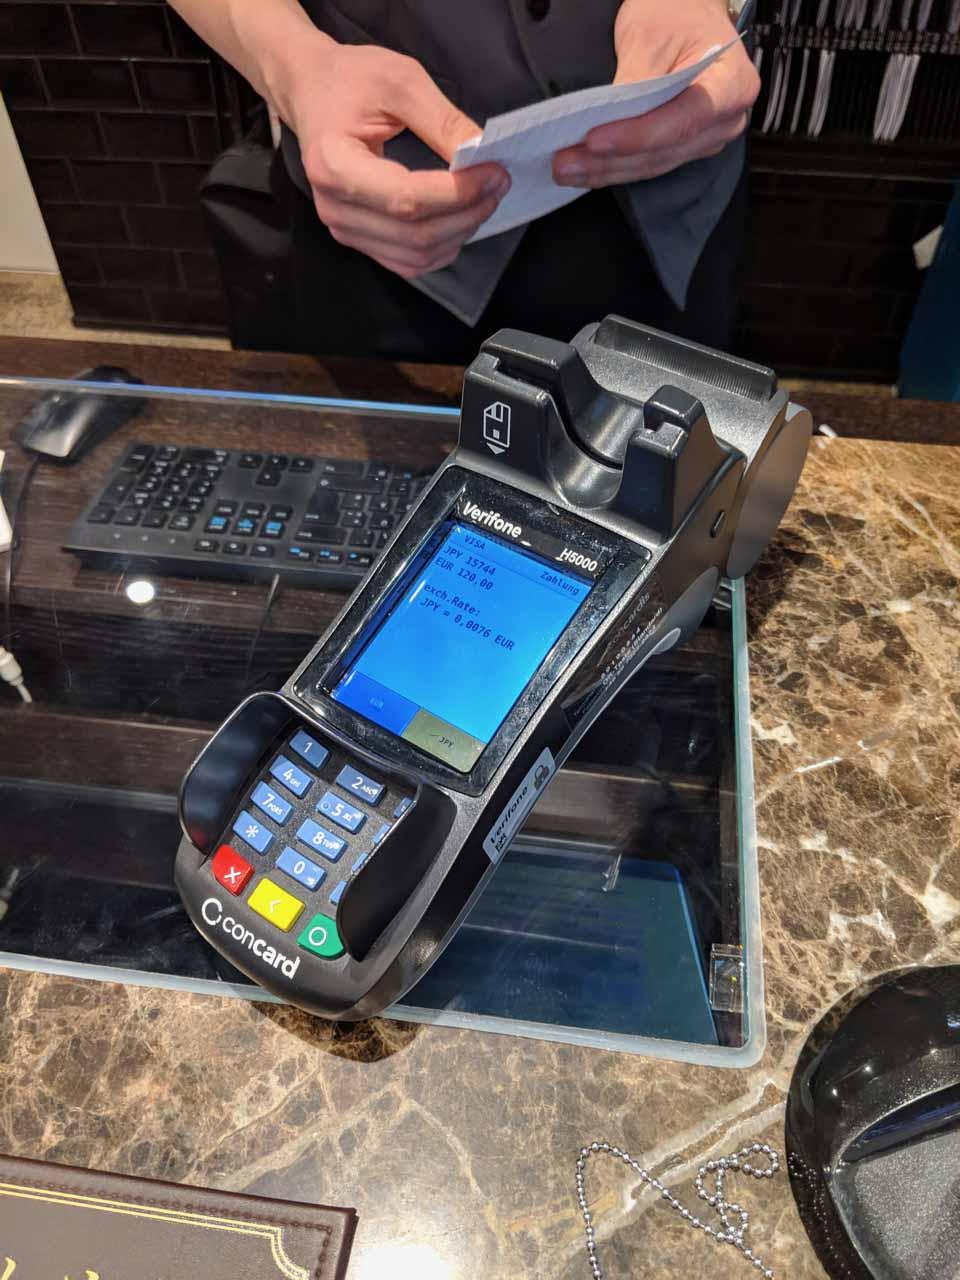 DCC(Dynamic Currency Conversion)の一例。ホテル代の支払いをユーロ建てか日本円建てかで選択できる